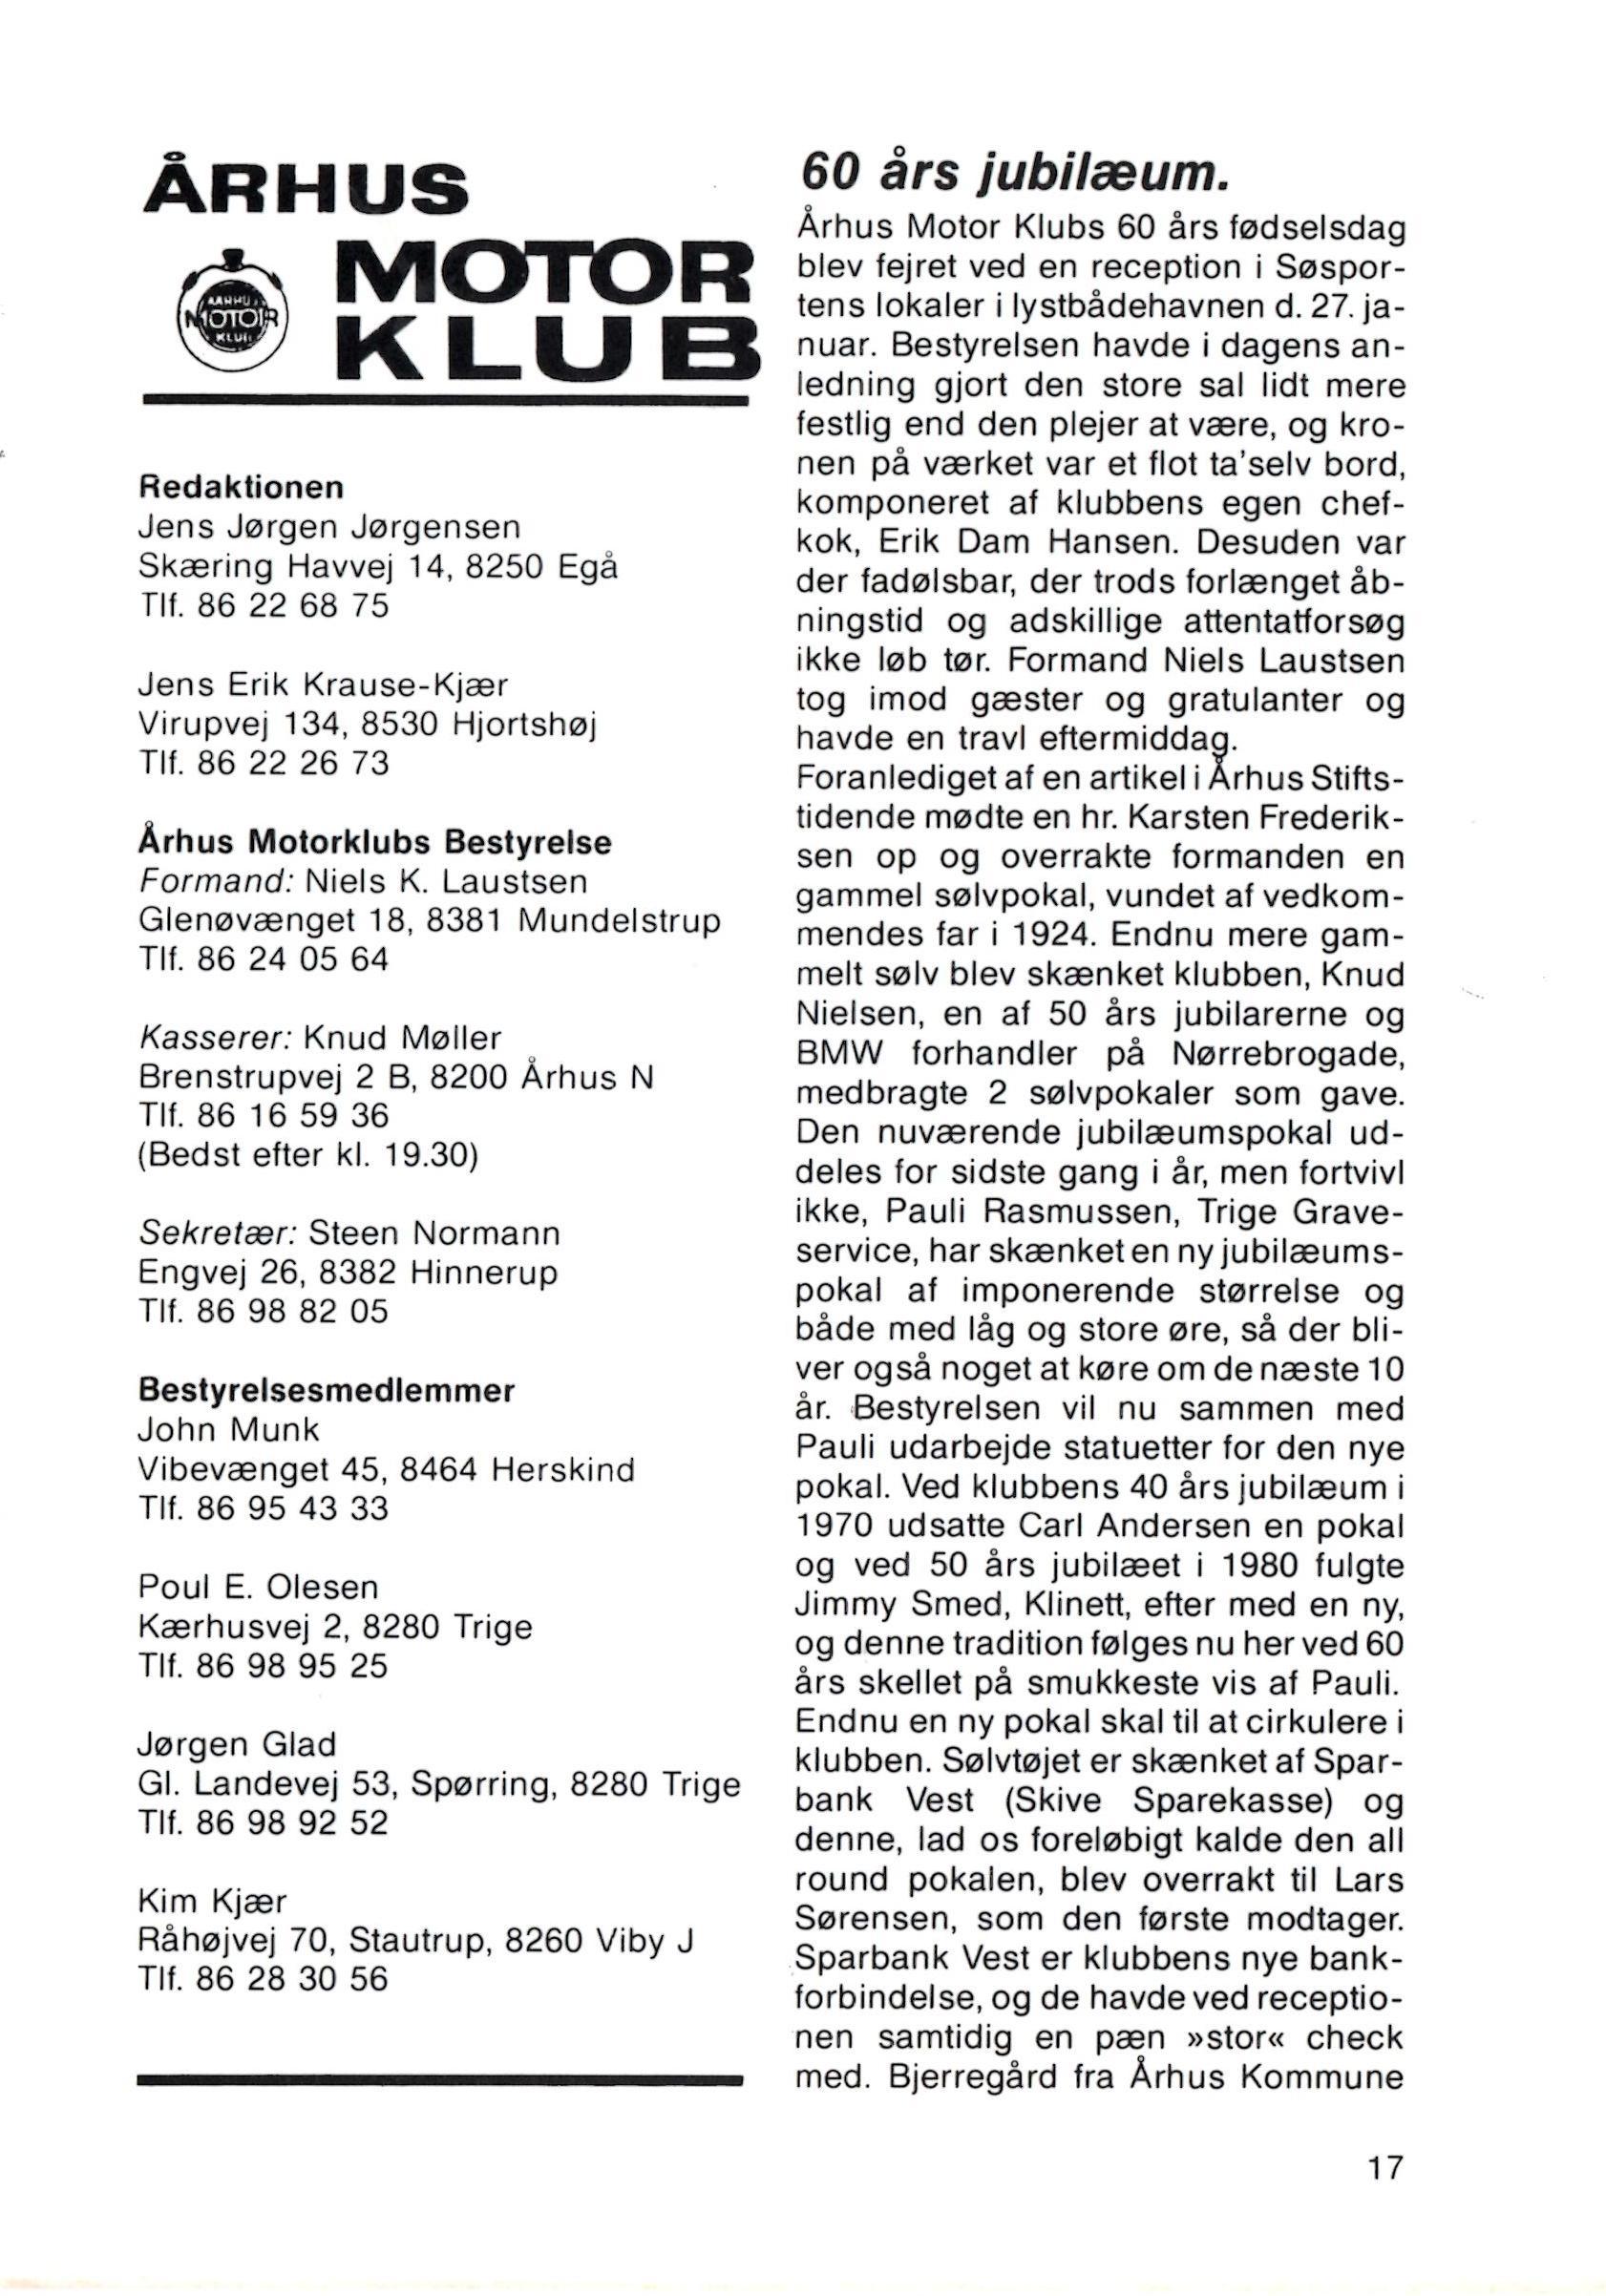 Omtale 1 marts 1990